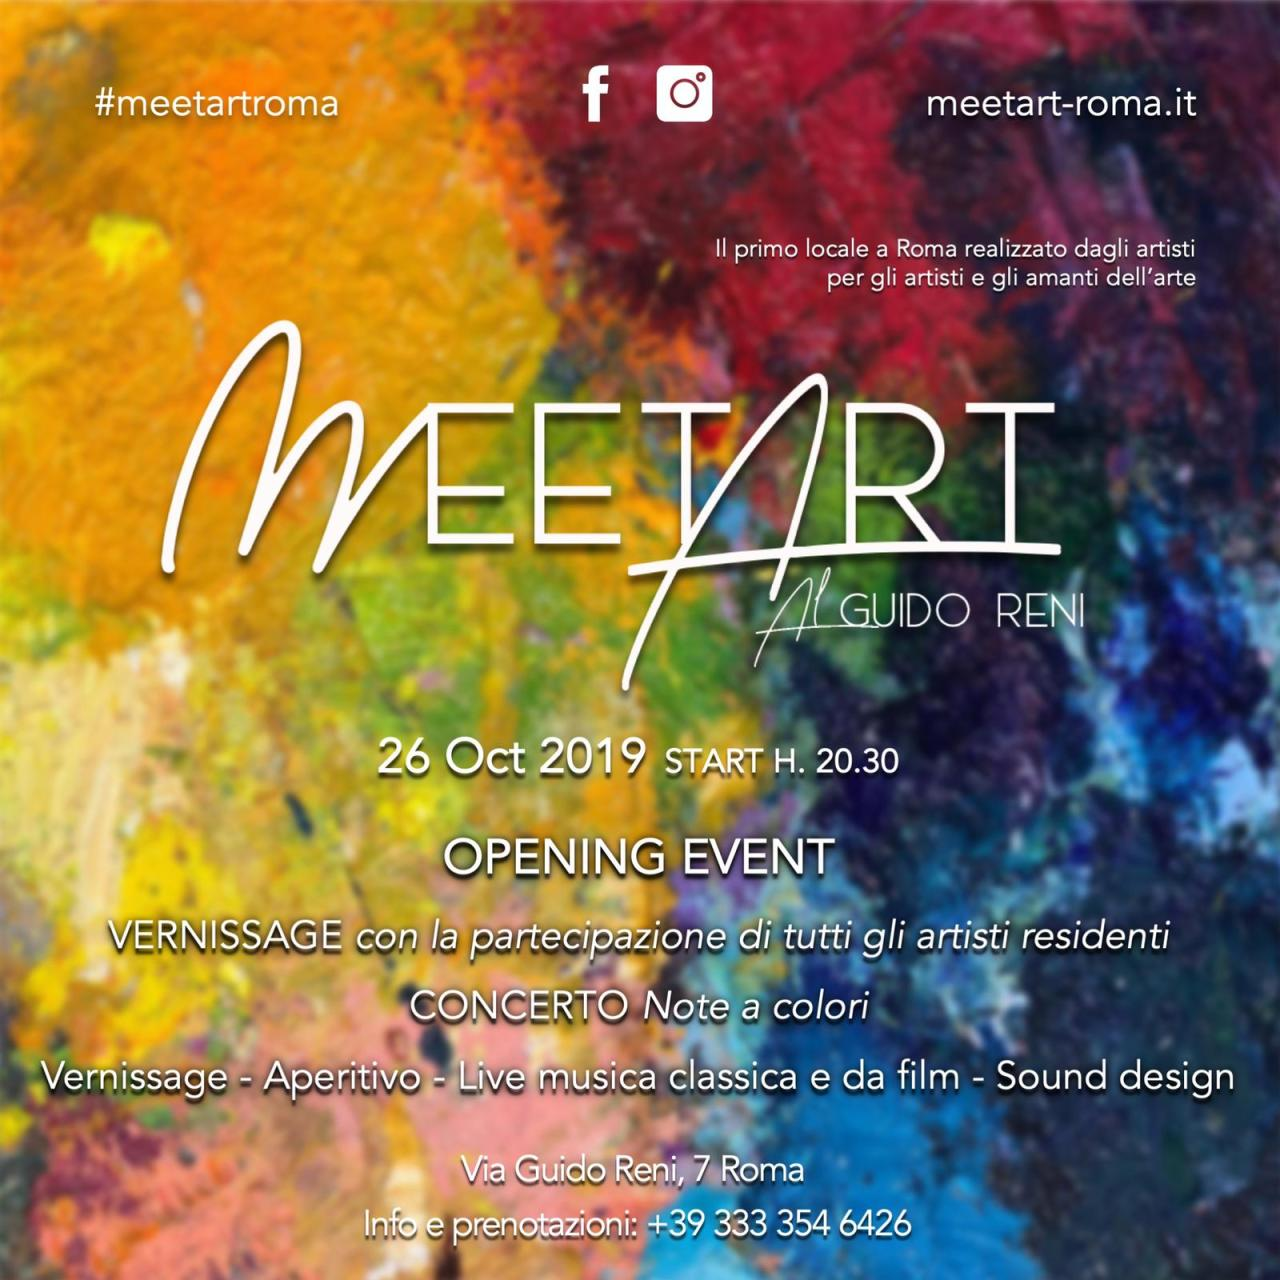 MeetArt al Guido Reni, a Roma, sabato 26 ottobre ore20.30